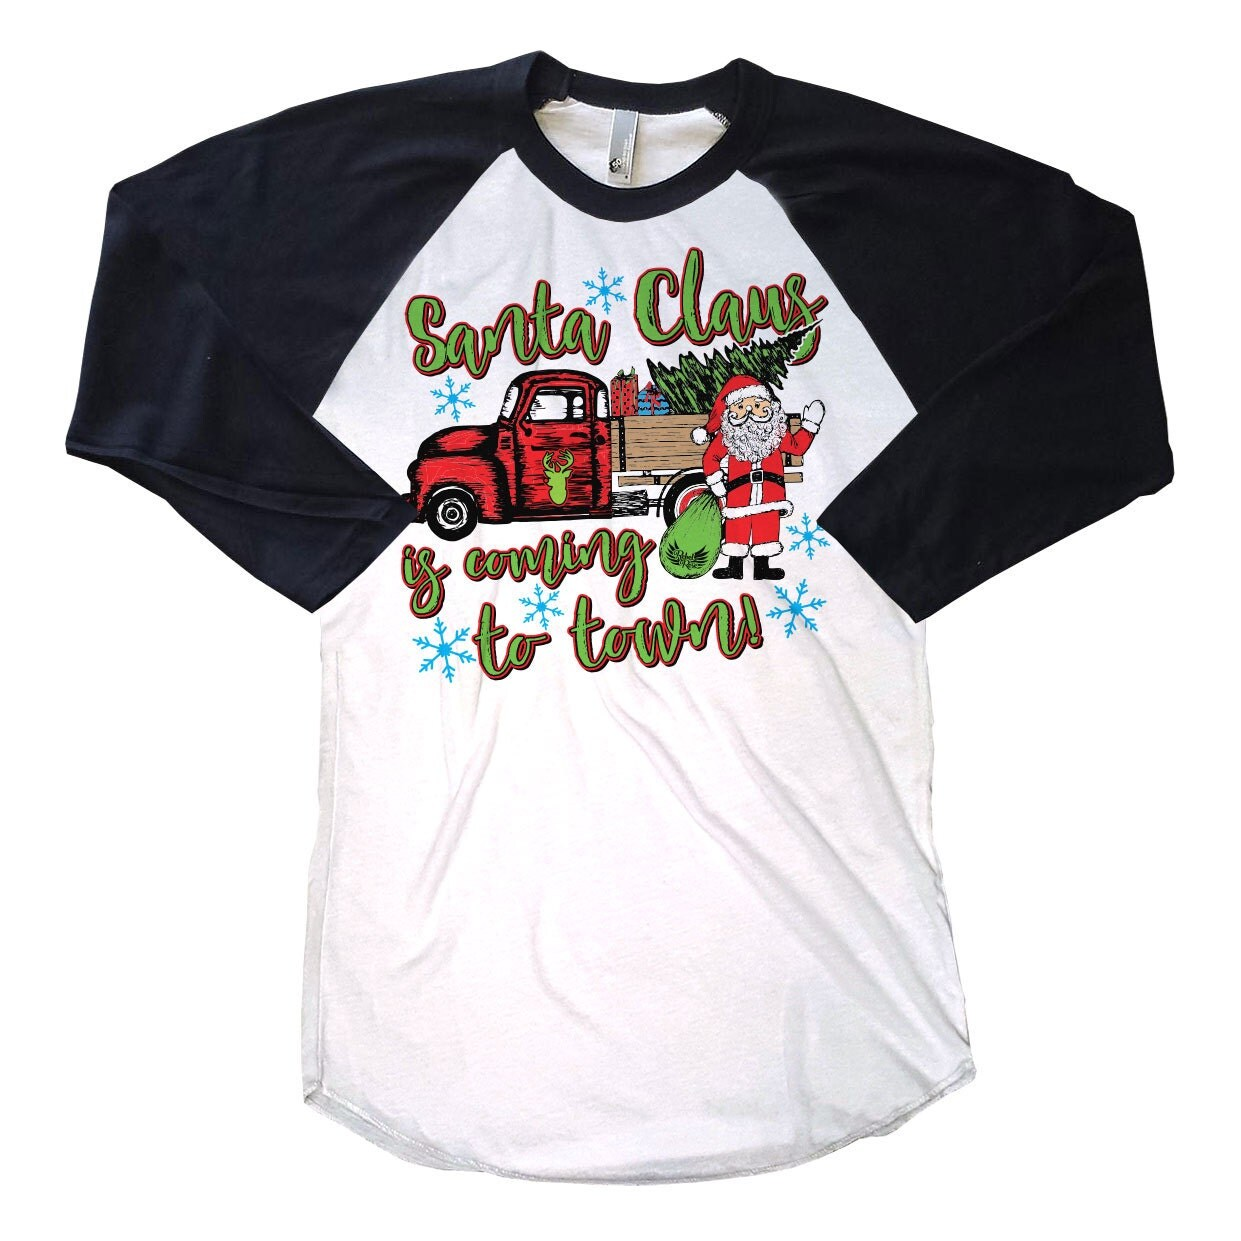 Christmas Shirts Womenu0026#39;s Christmas Shirts Santa Claus